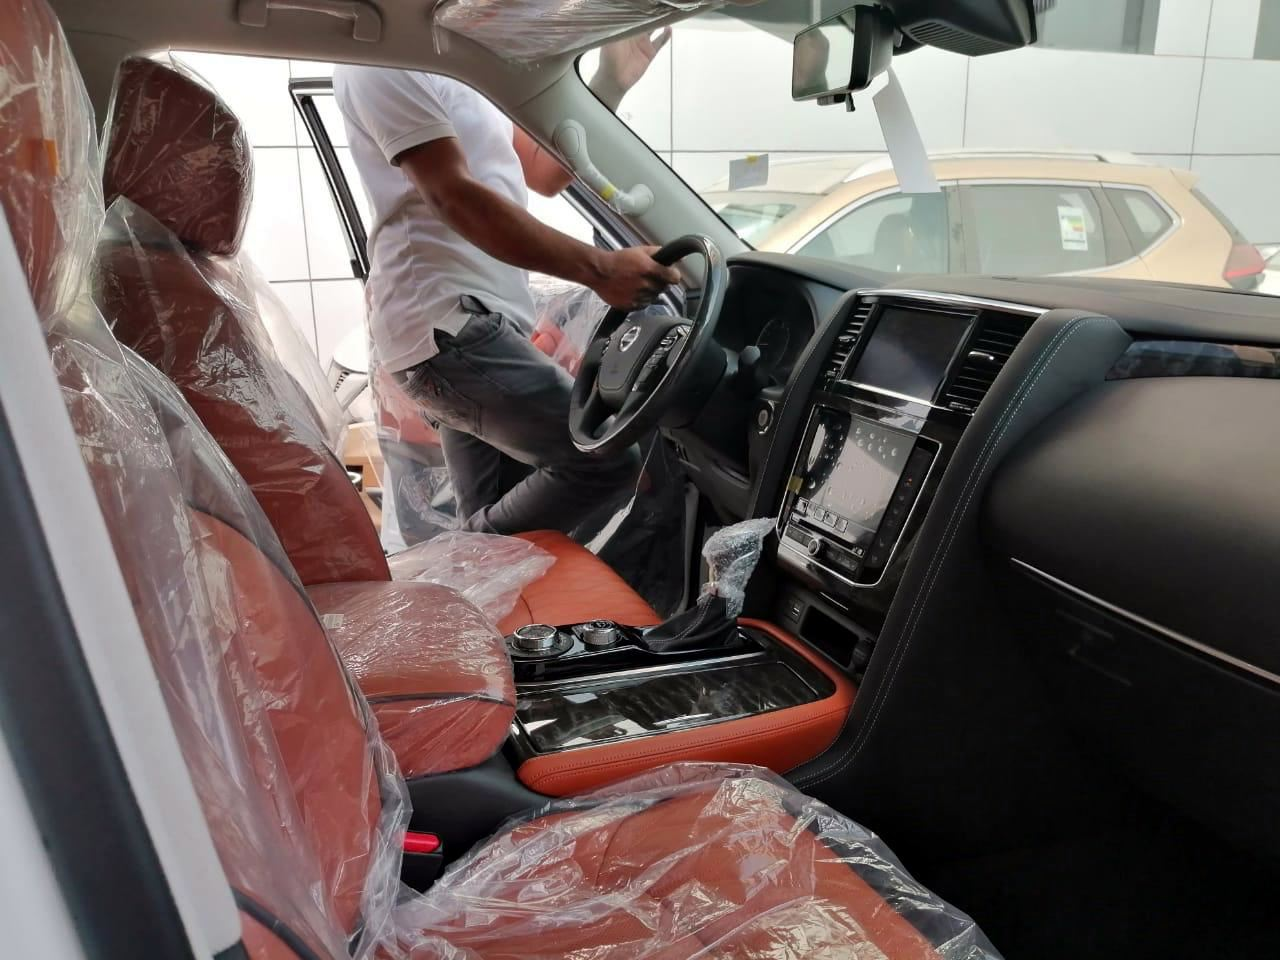 New Nissan Patrol 2020 Inside.jpg